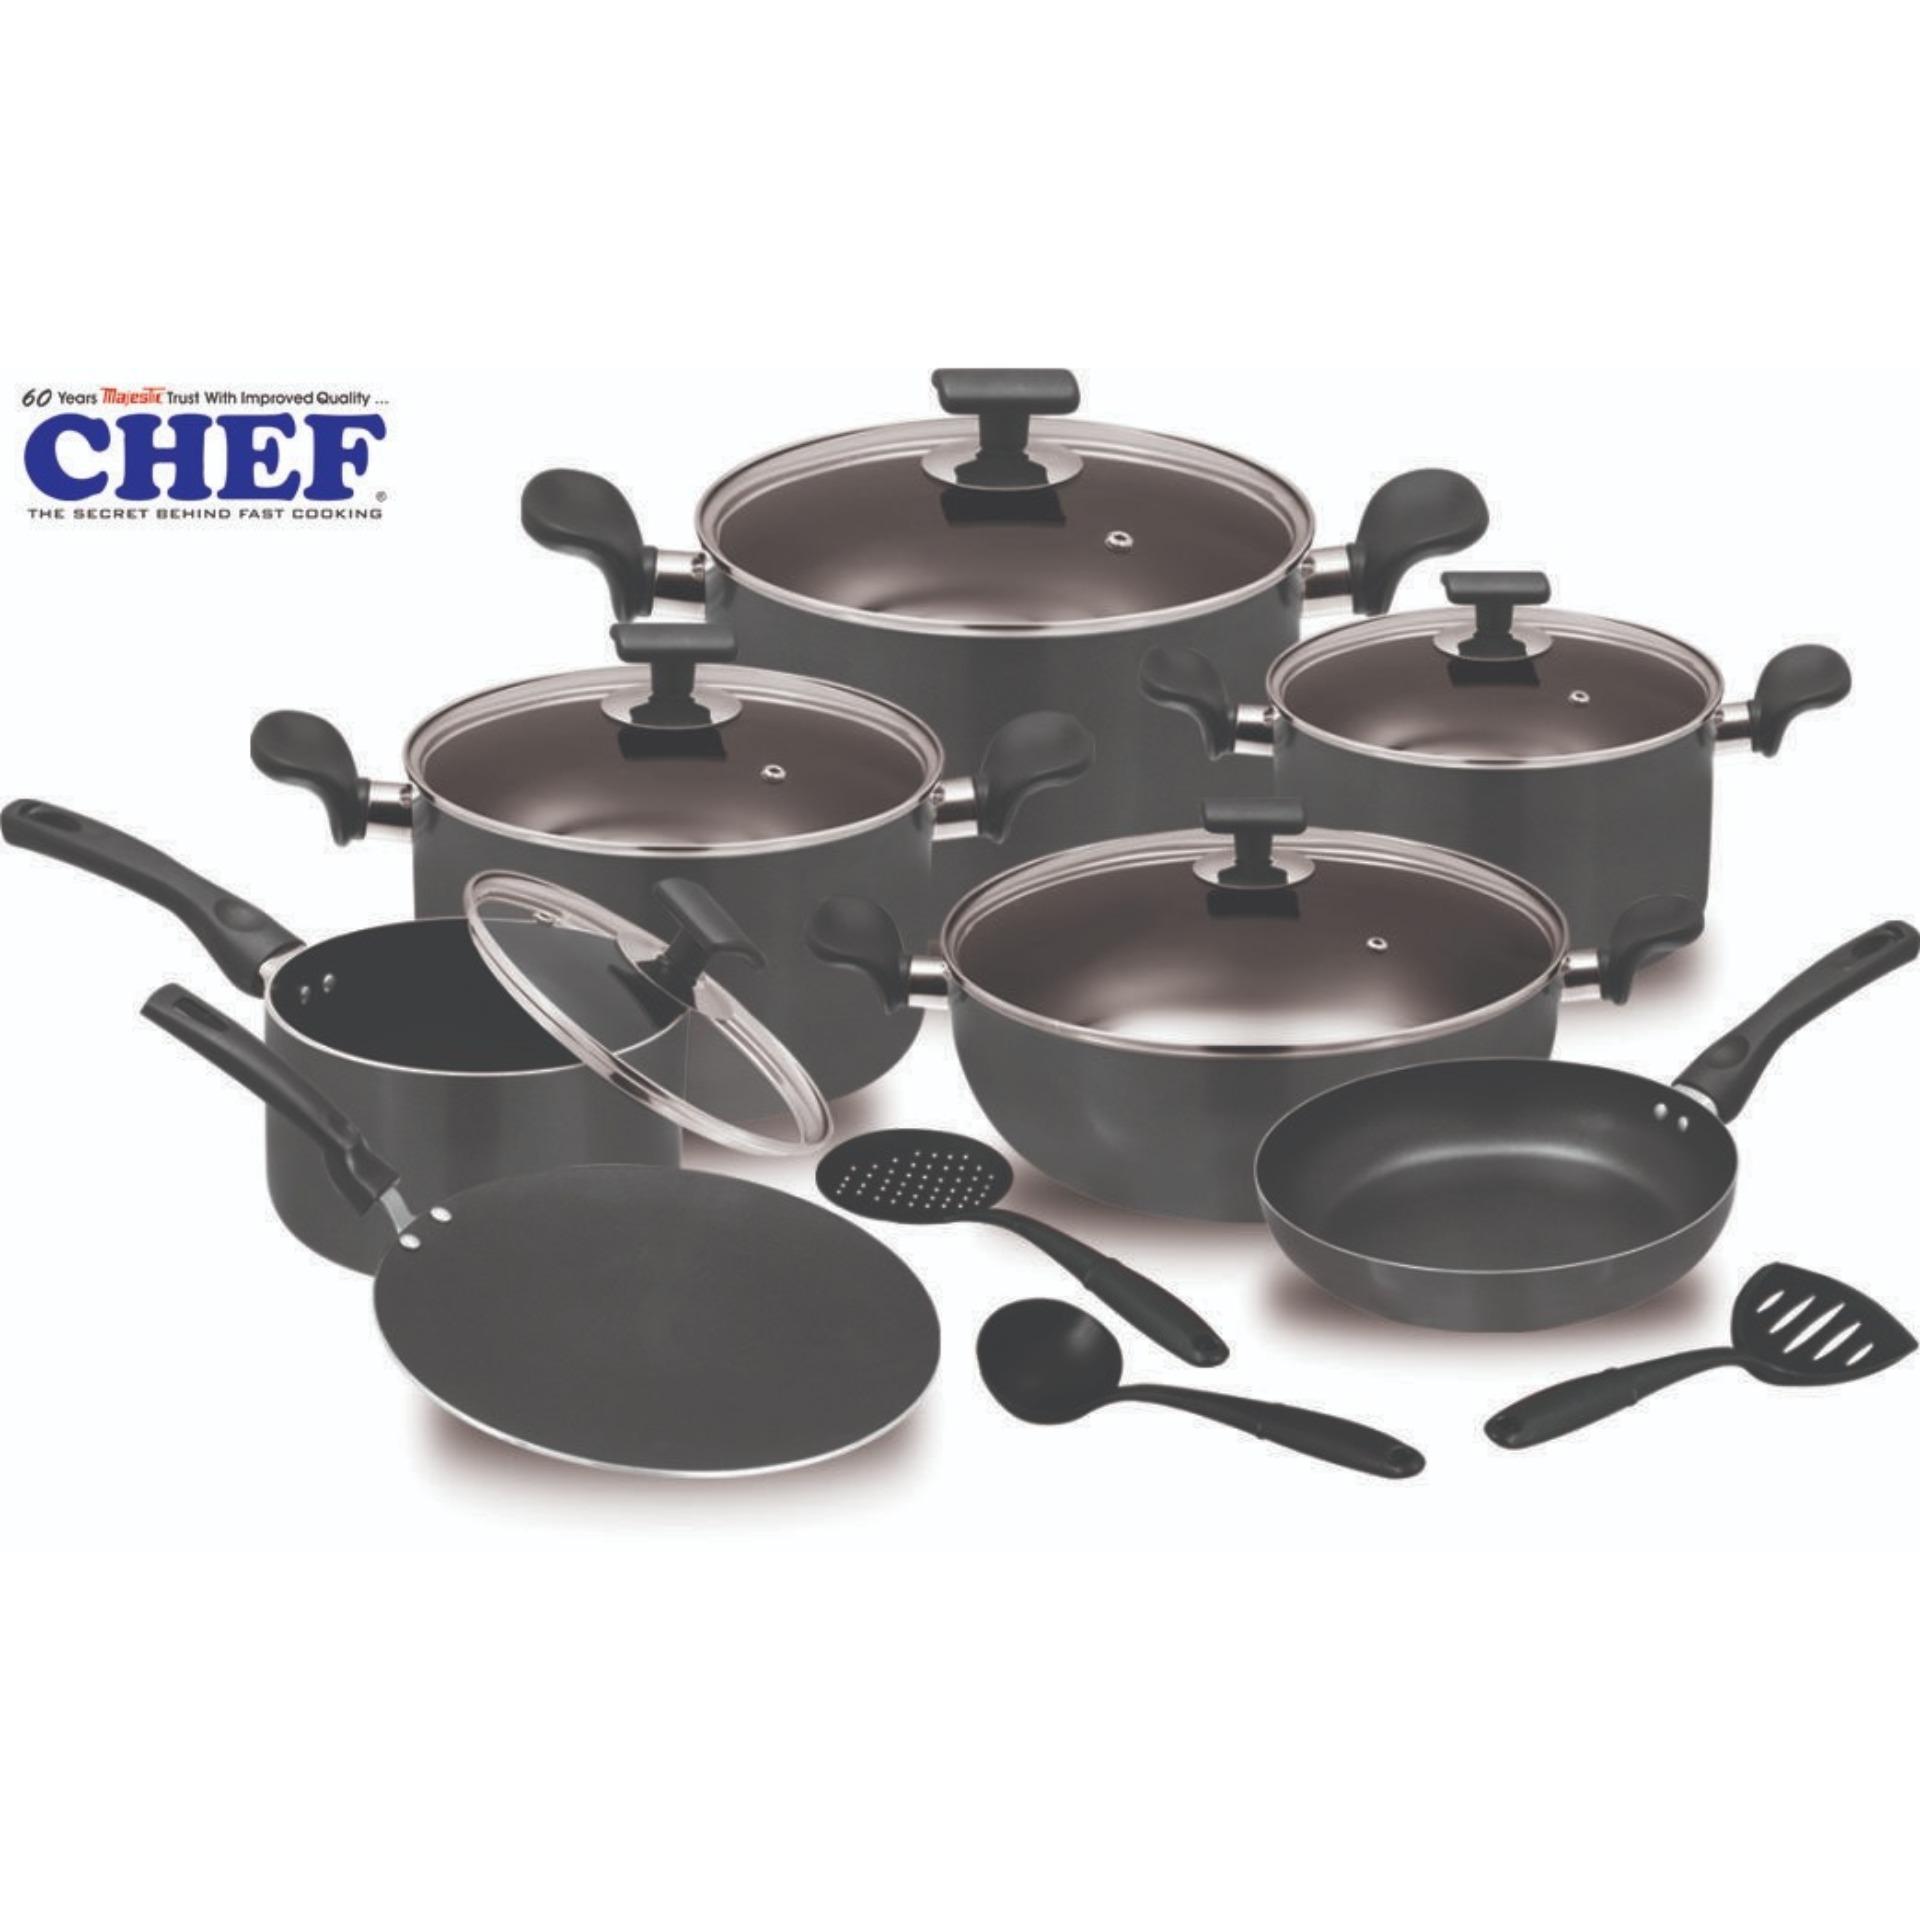 15pcs Cooking Set Nonstick Cookware